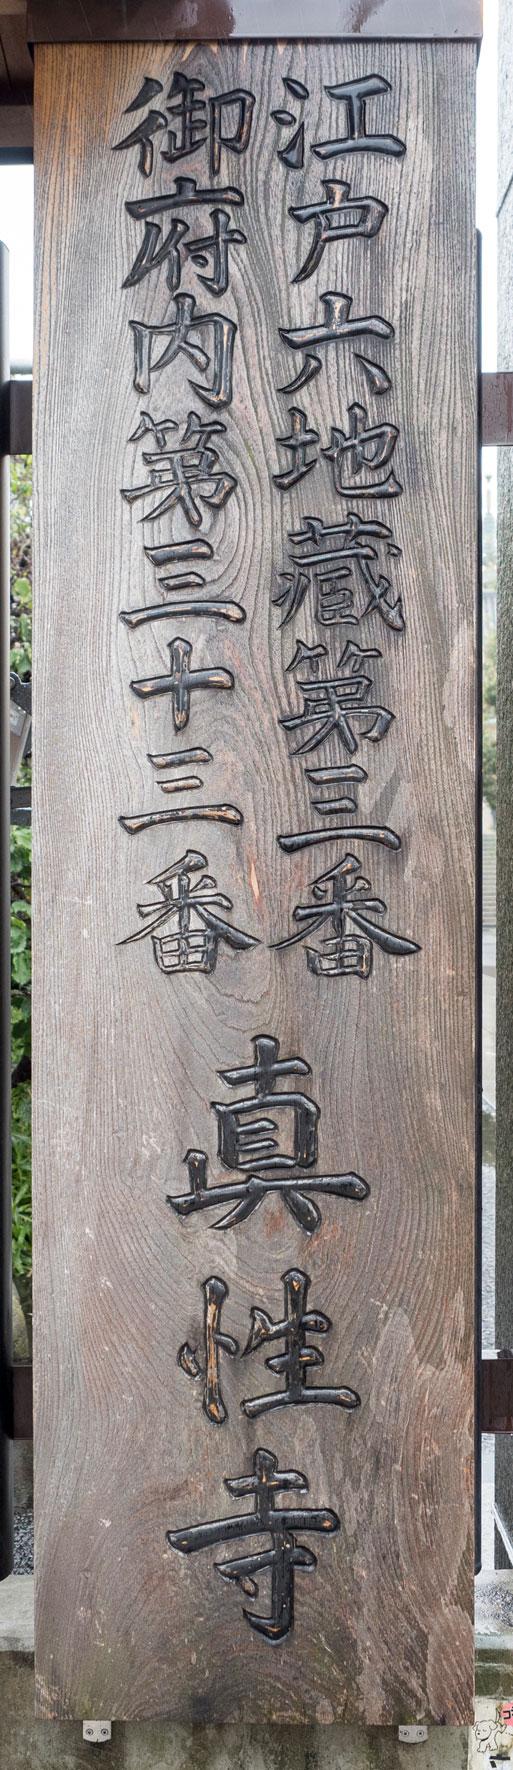 2017-09-17-jp-tokyo-sugamo-signboard-01.jpg